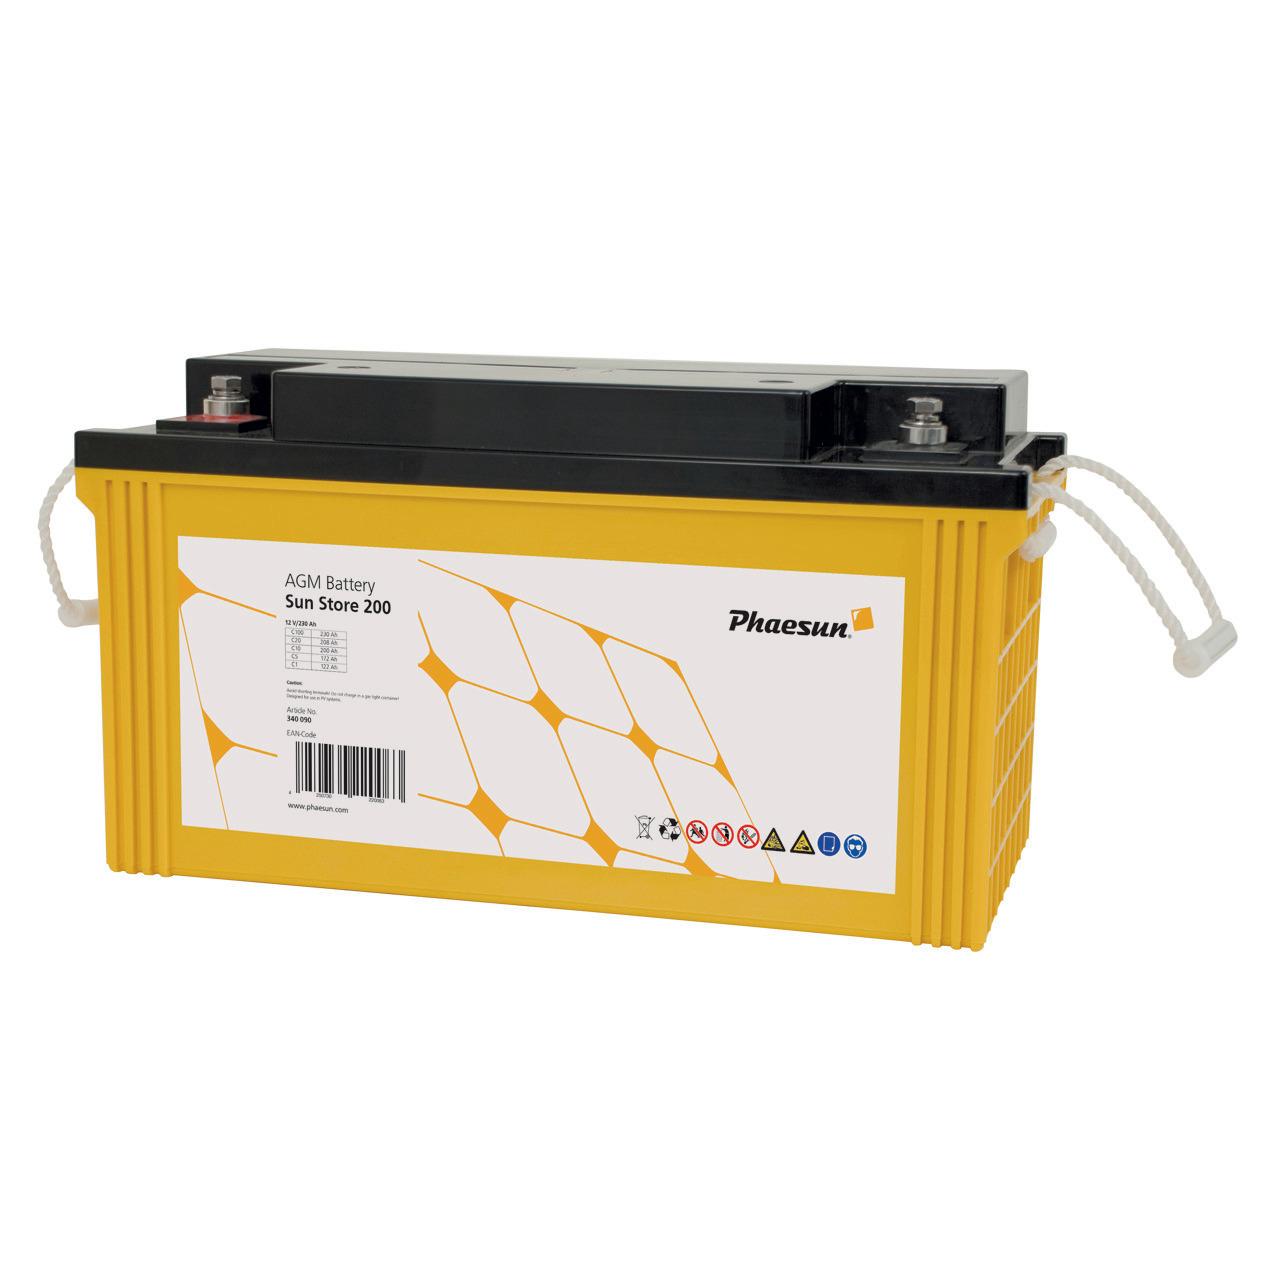 Phaesun Blei-AGM-Akku Sun Store 200- 12 V- 200 Ah